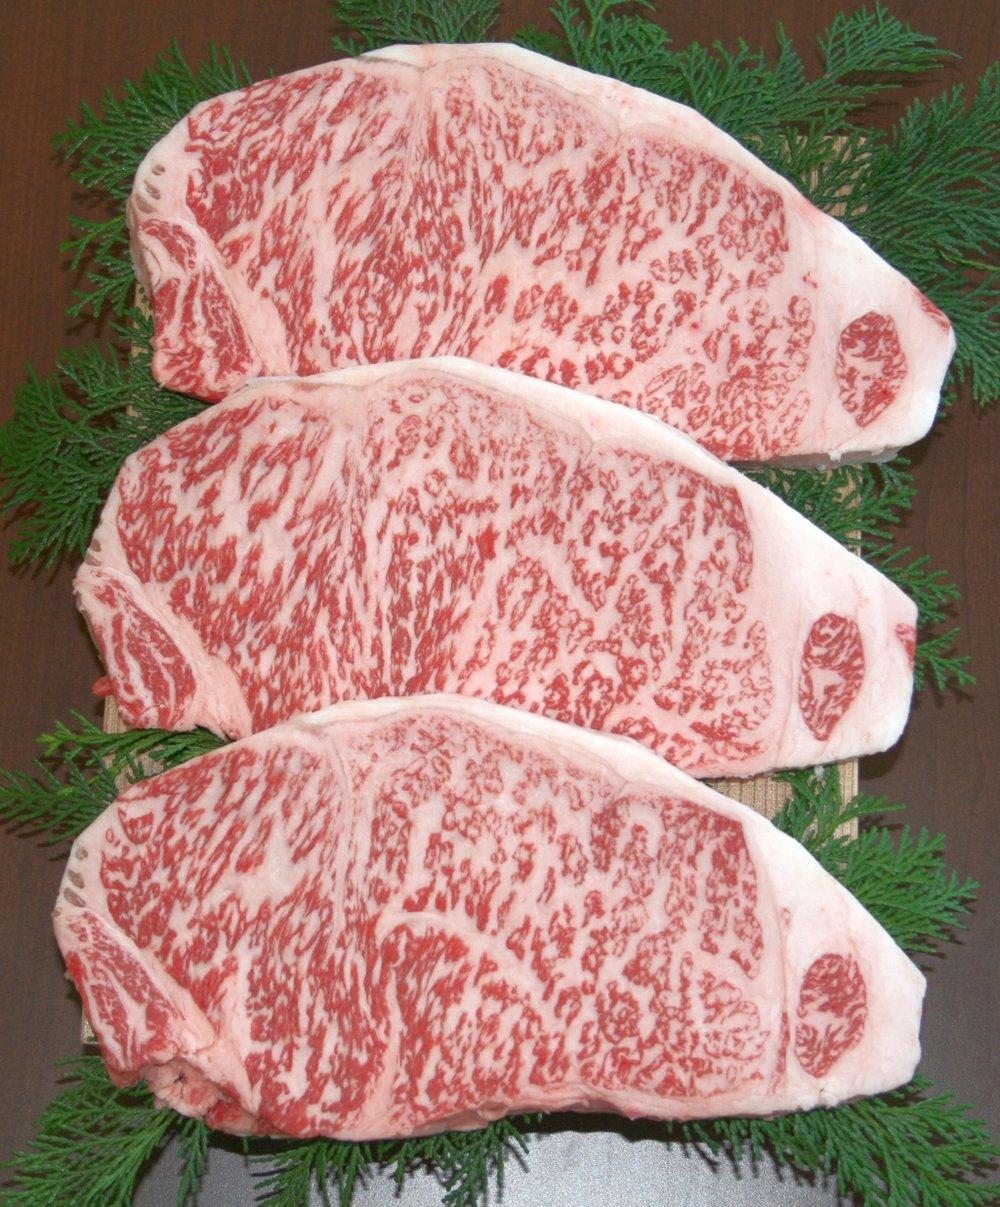 Miyazaki Steak Image RS1511.jpg